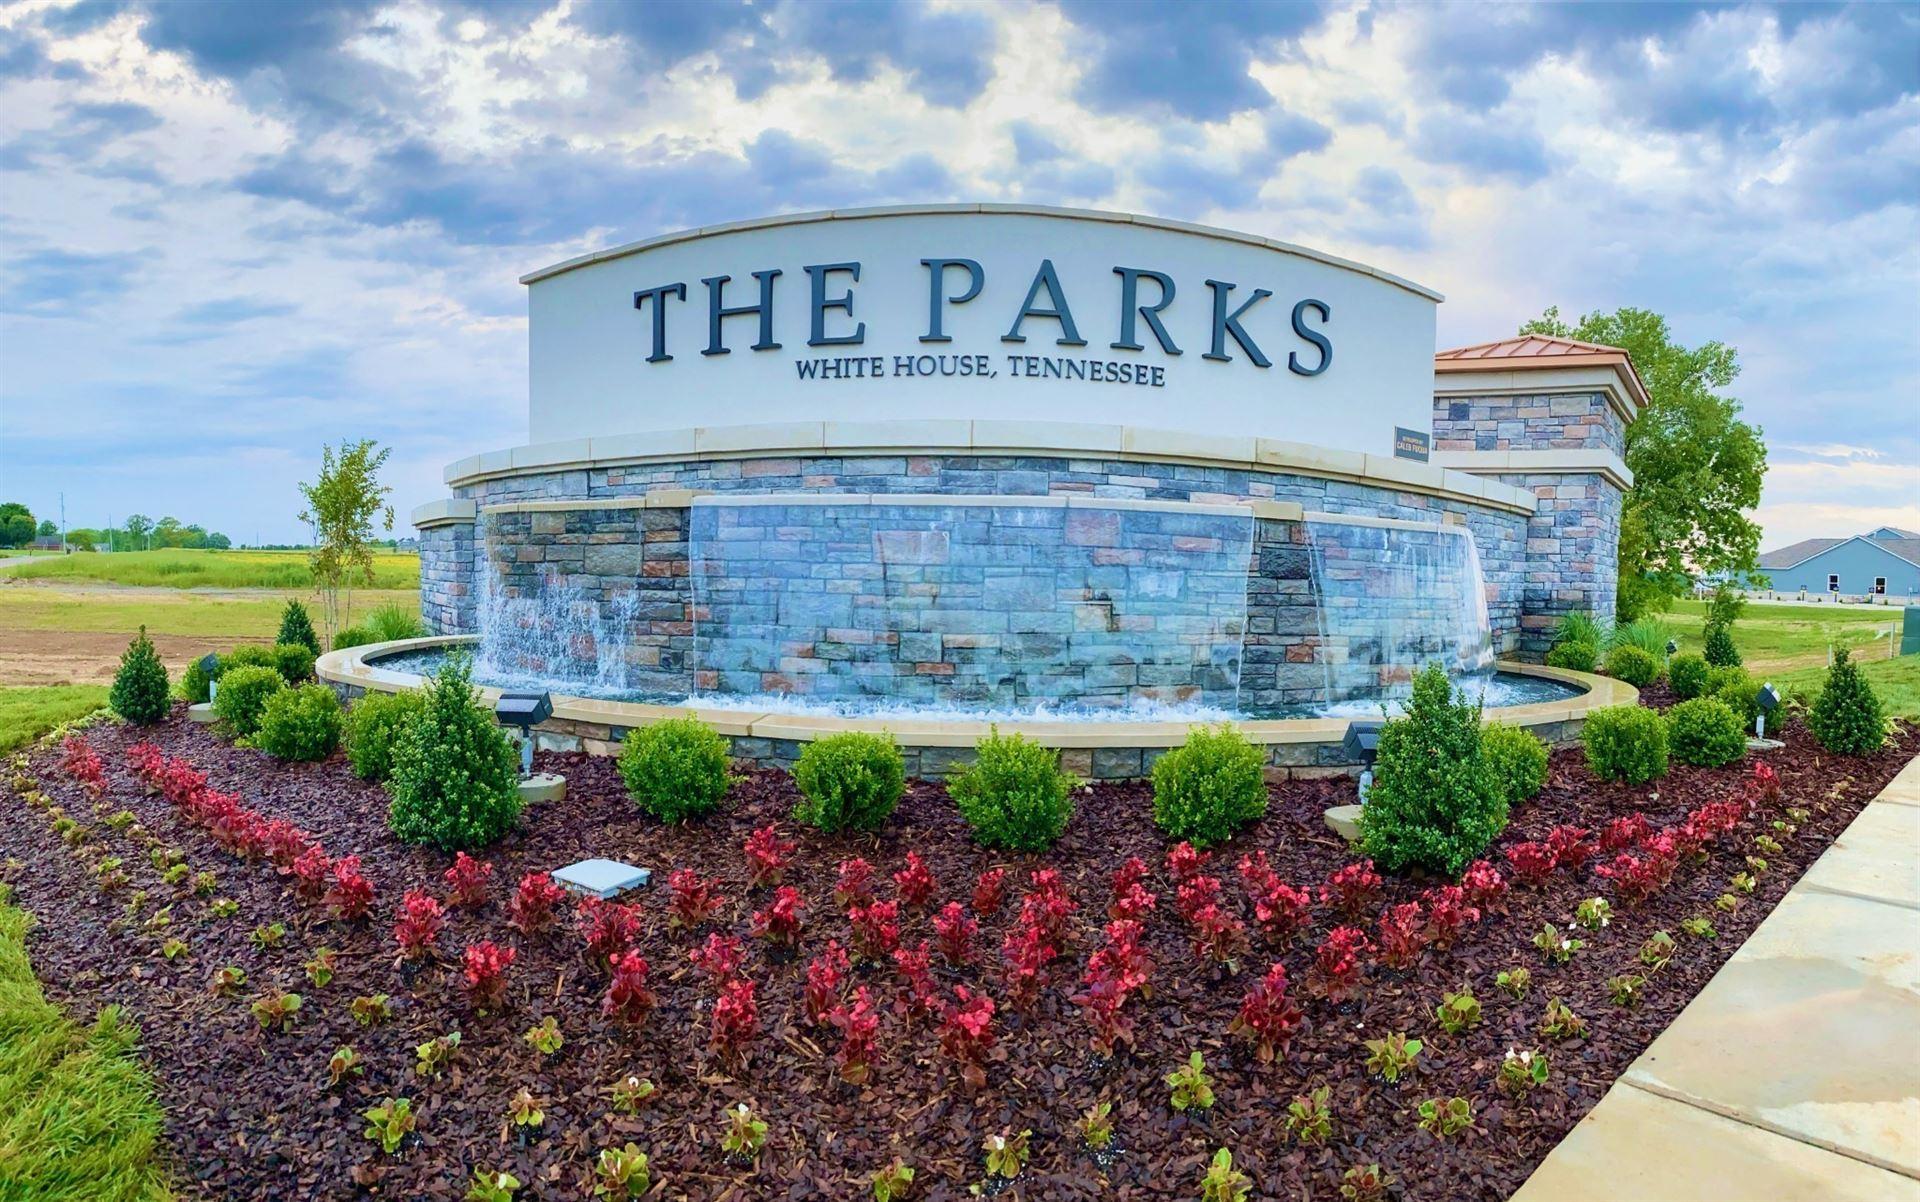 7029 Sunny Parks Dr, White House, TN 37188 - MLS#: 2205647